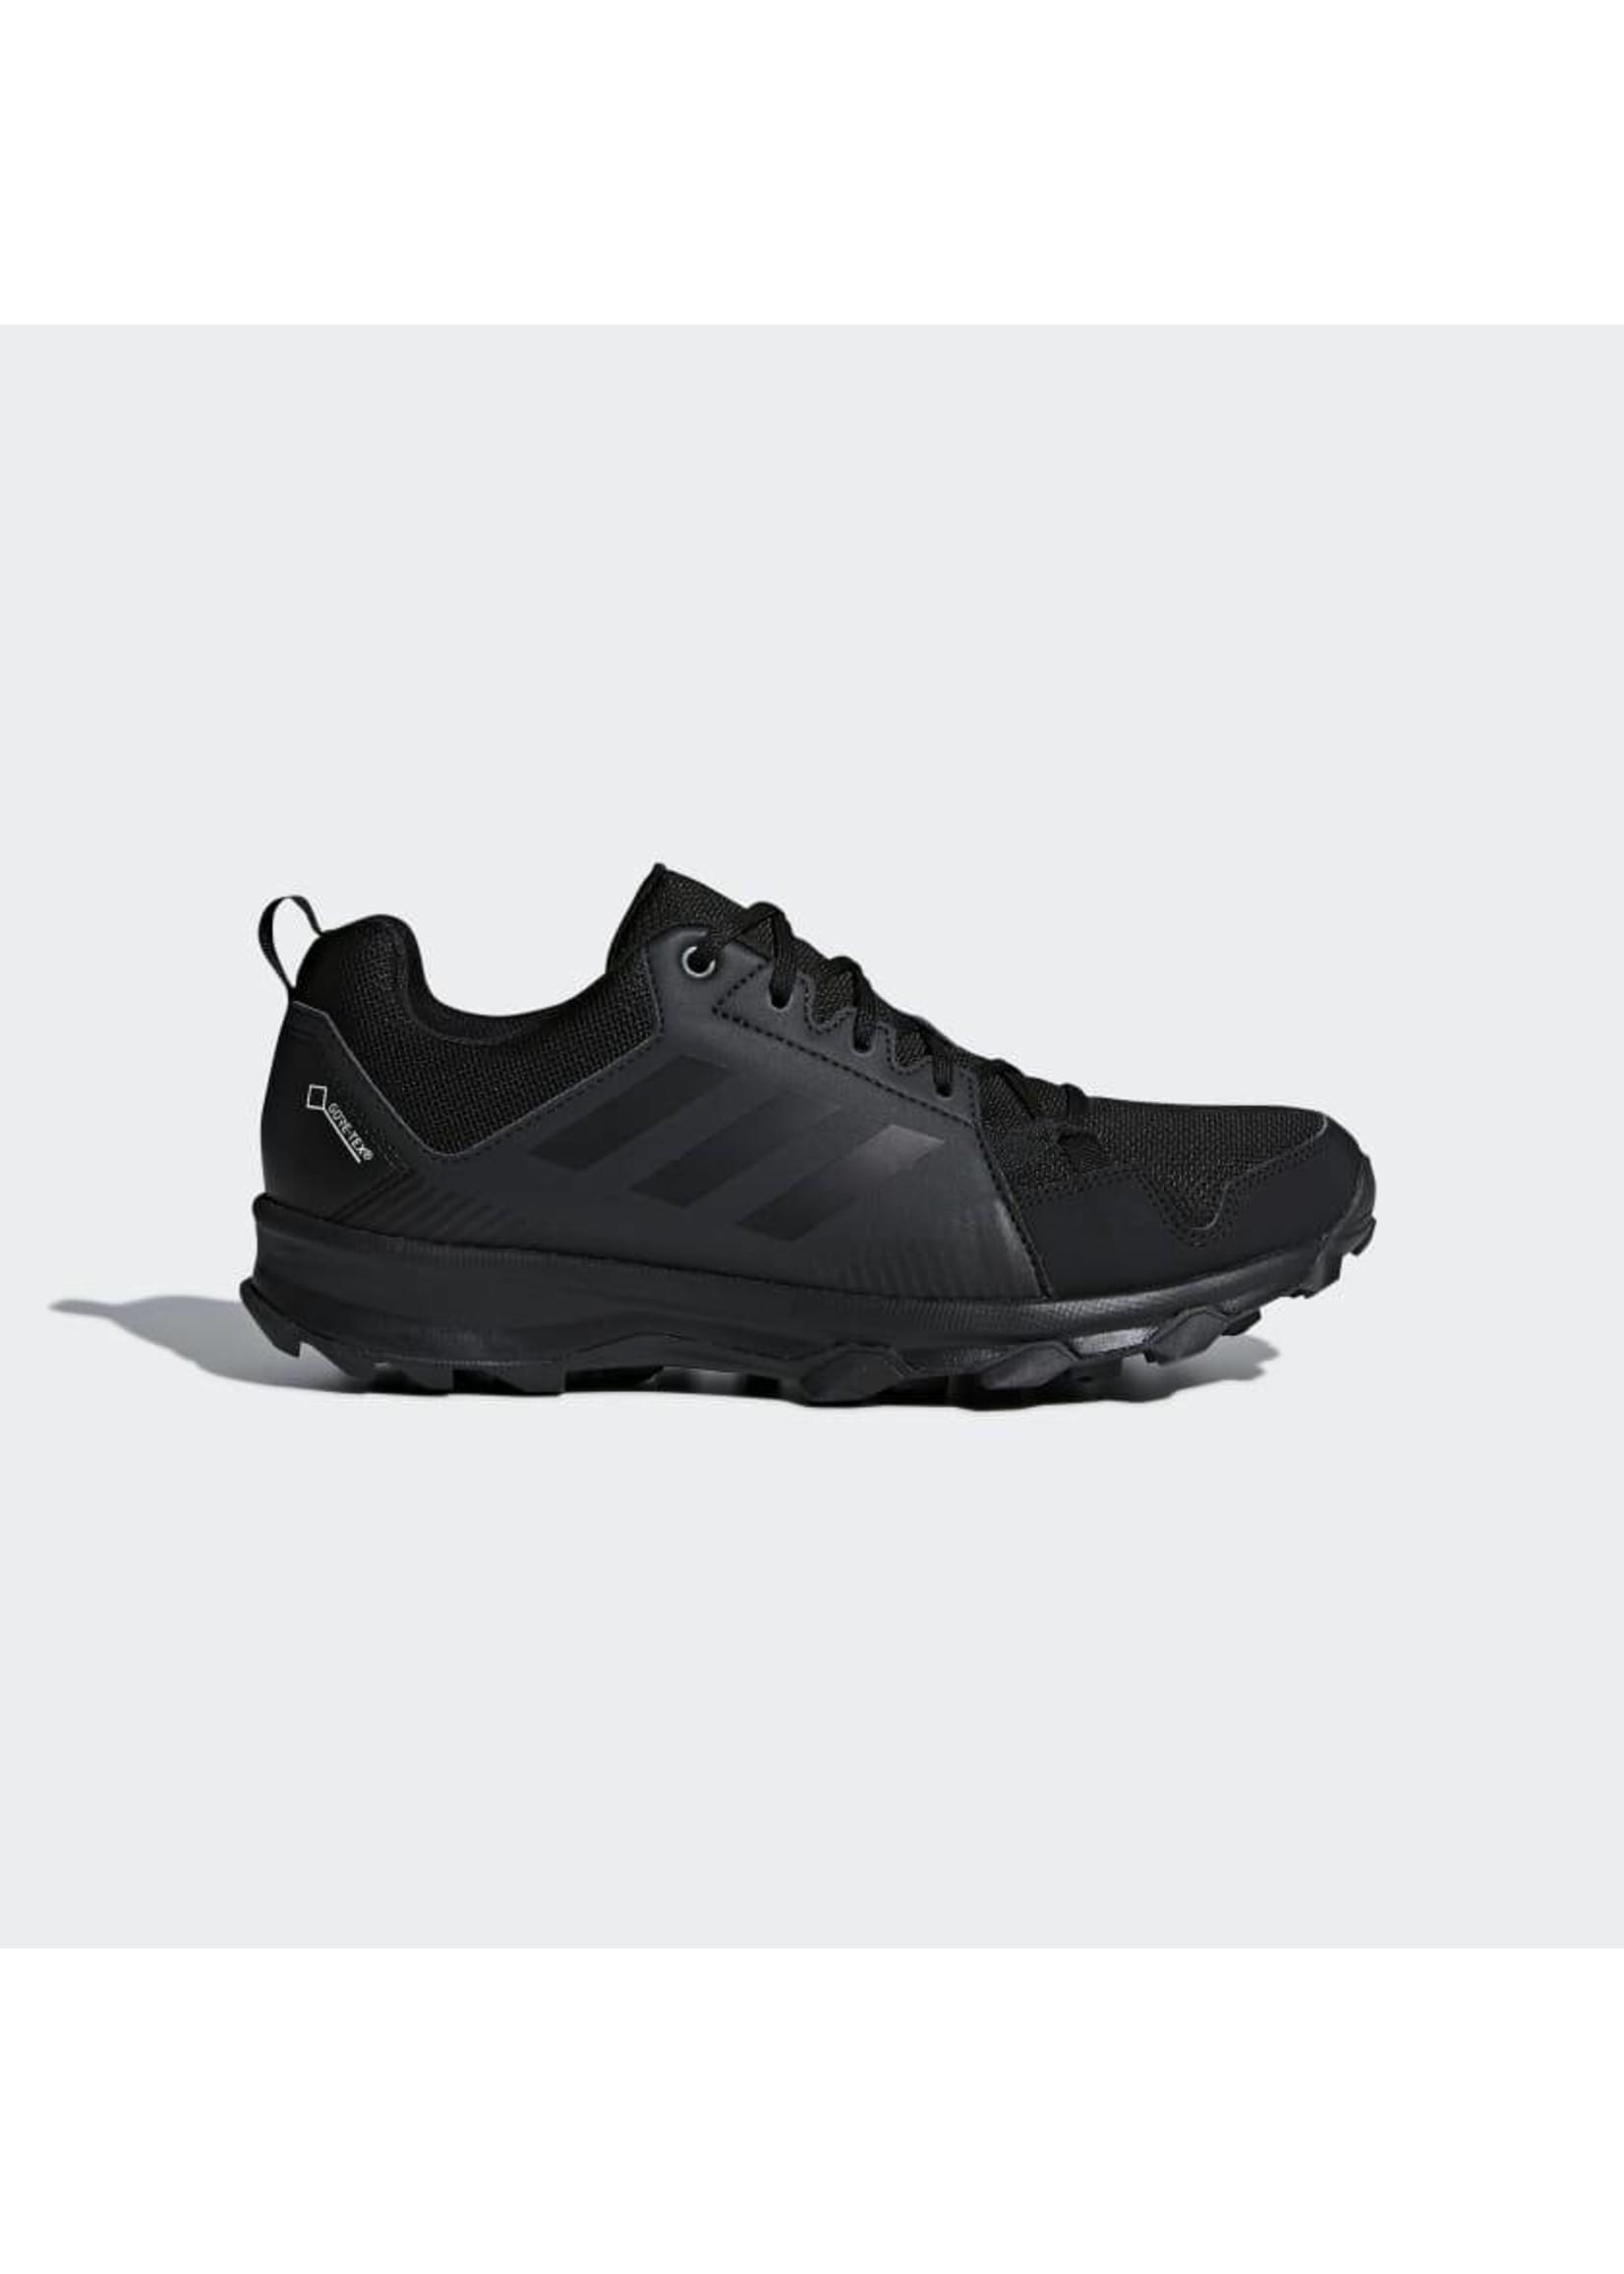 Adidas Adidas Terrex Tracerocker GTX Mens Trail Shoe